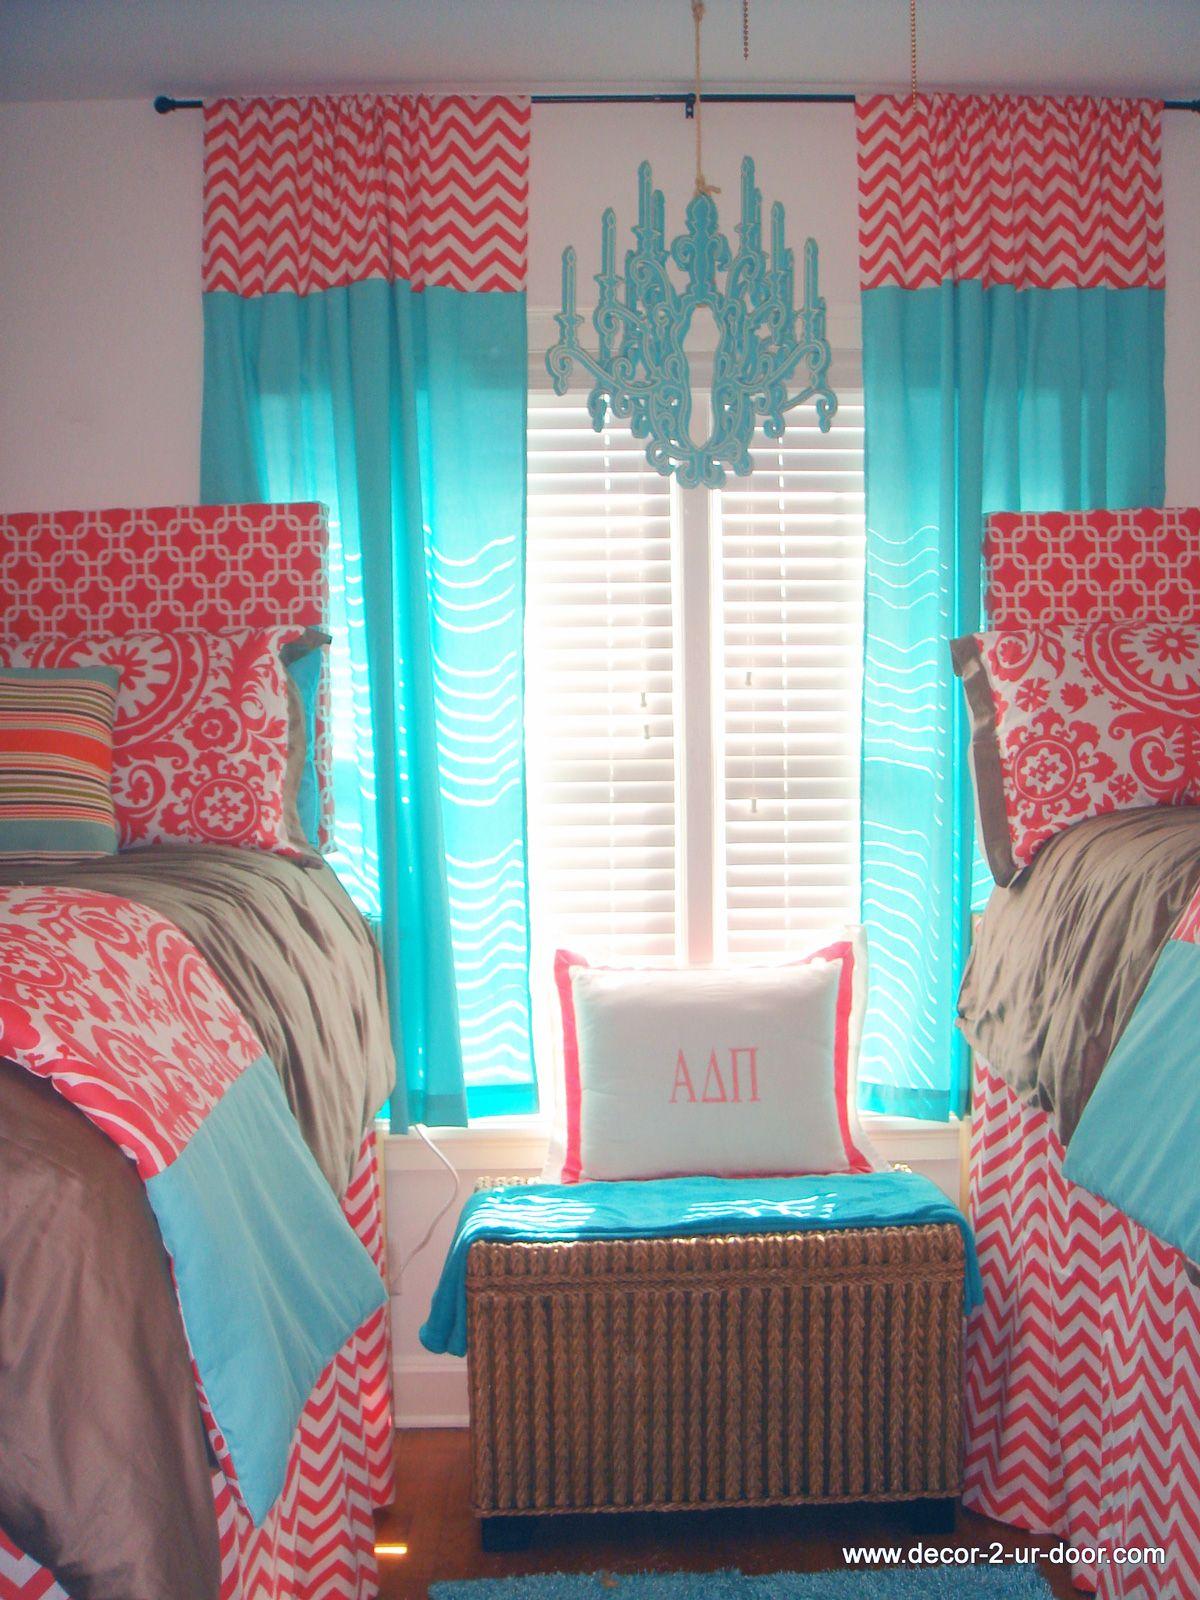 Sorority house tours room coral and tiffany blue dorm decor dorm